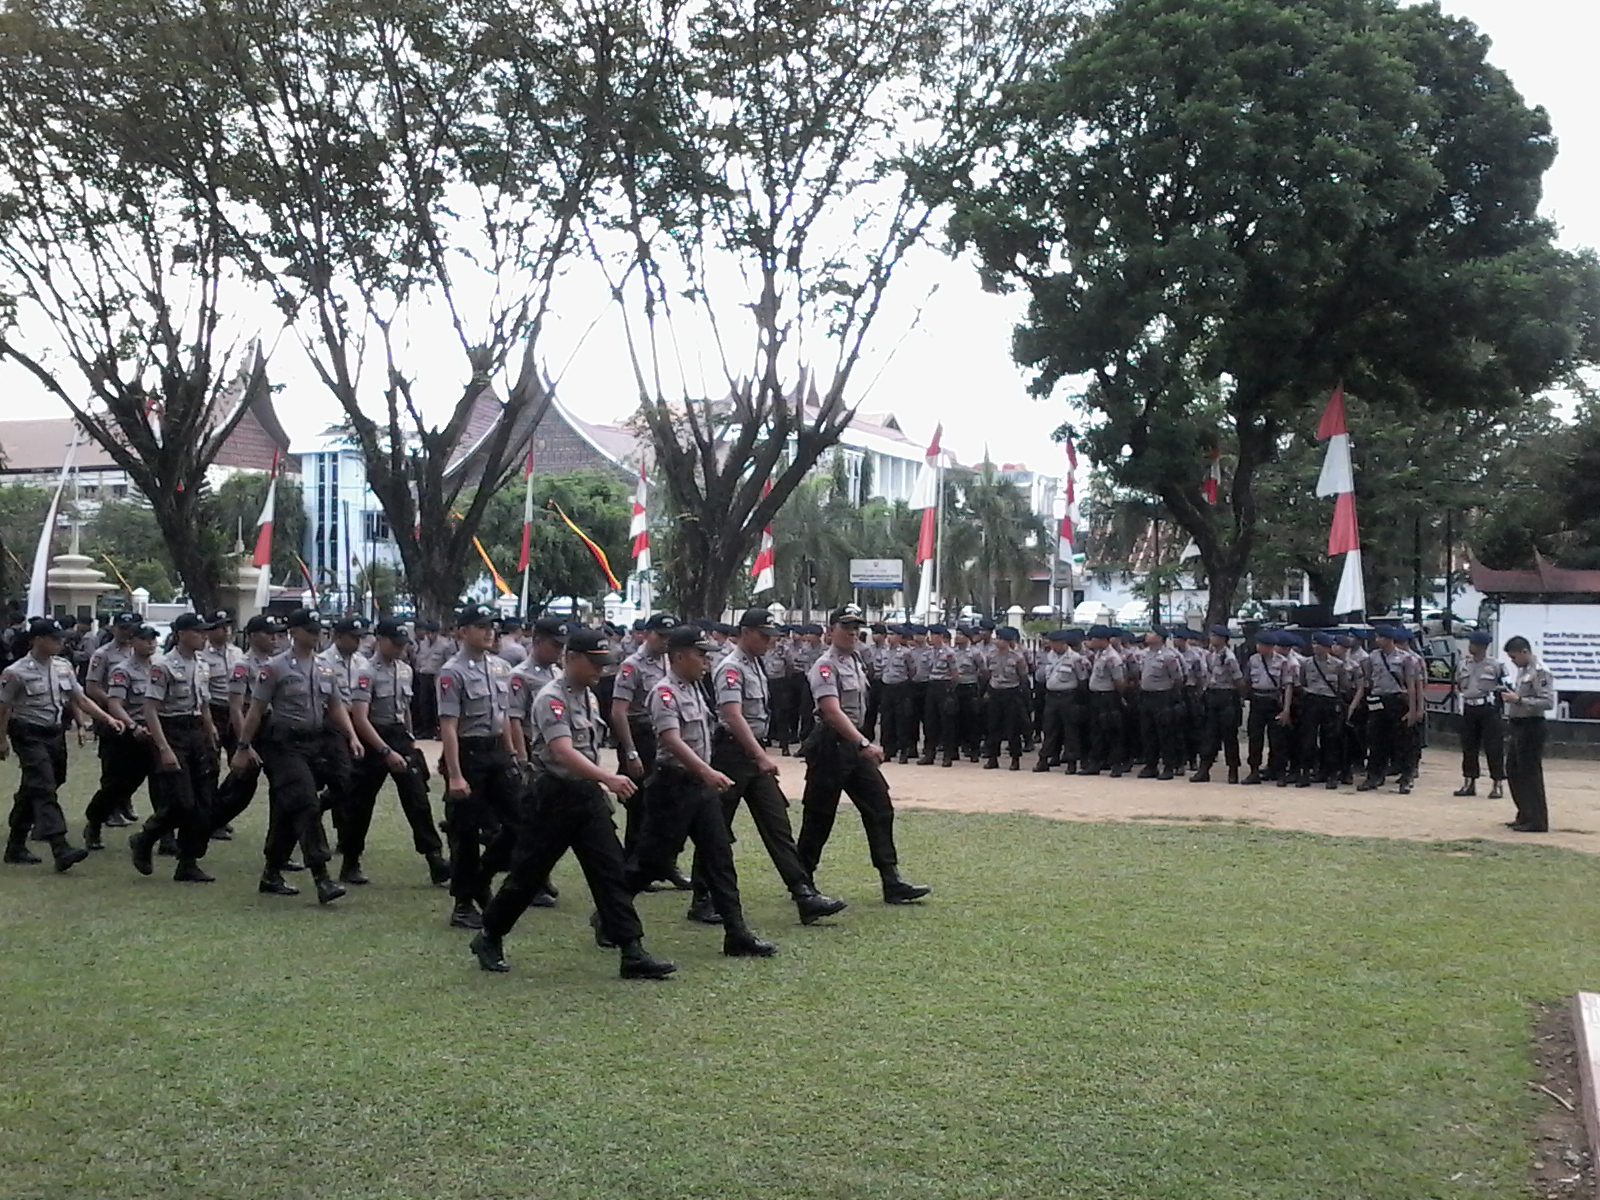 Apel Pagi Siaga 1 Pengamanan kepolisian jelang putusan Mahkamah Konstitusi terkait sengketa Pilpre di Mapolda Sumbar. Foto : Ikhwan